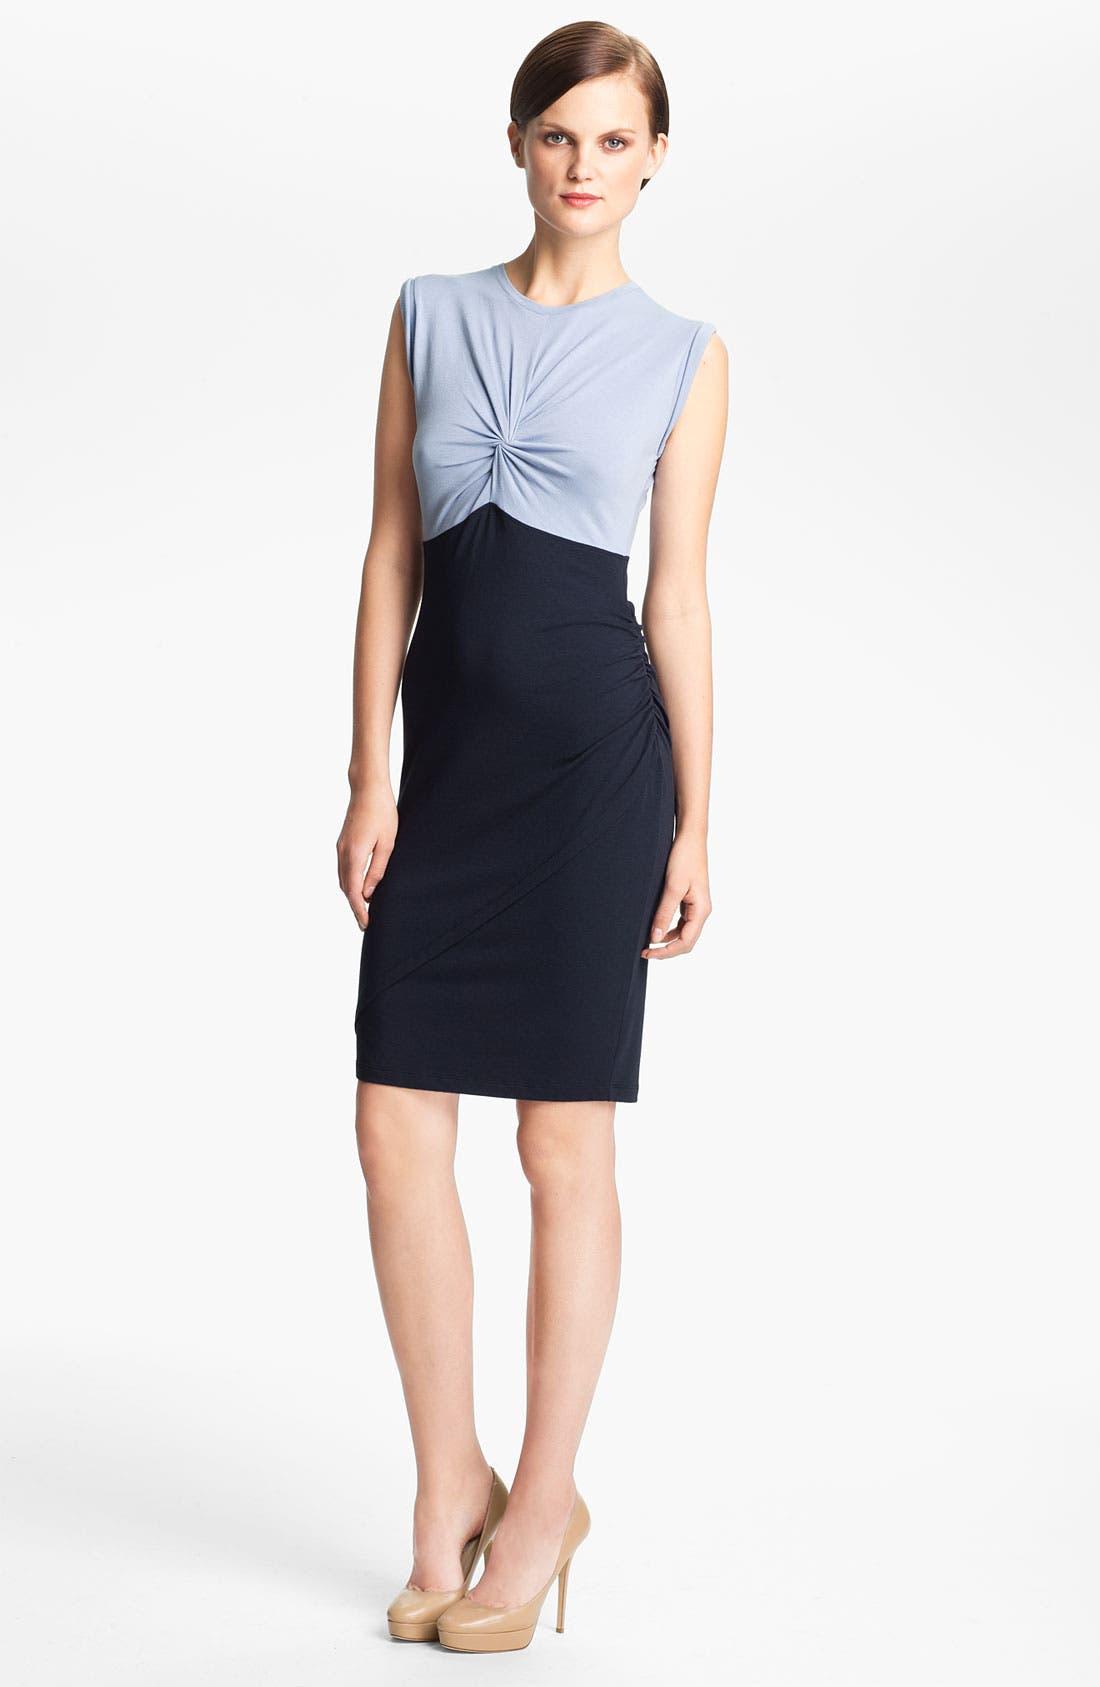 Alternate Image 1 Selected - Carven Twist Top Dress